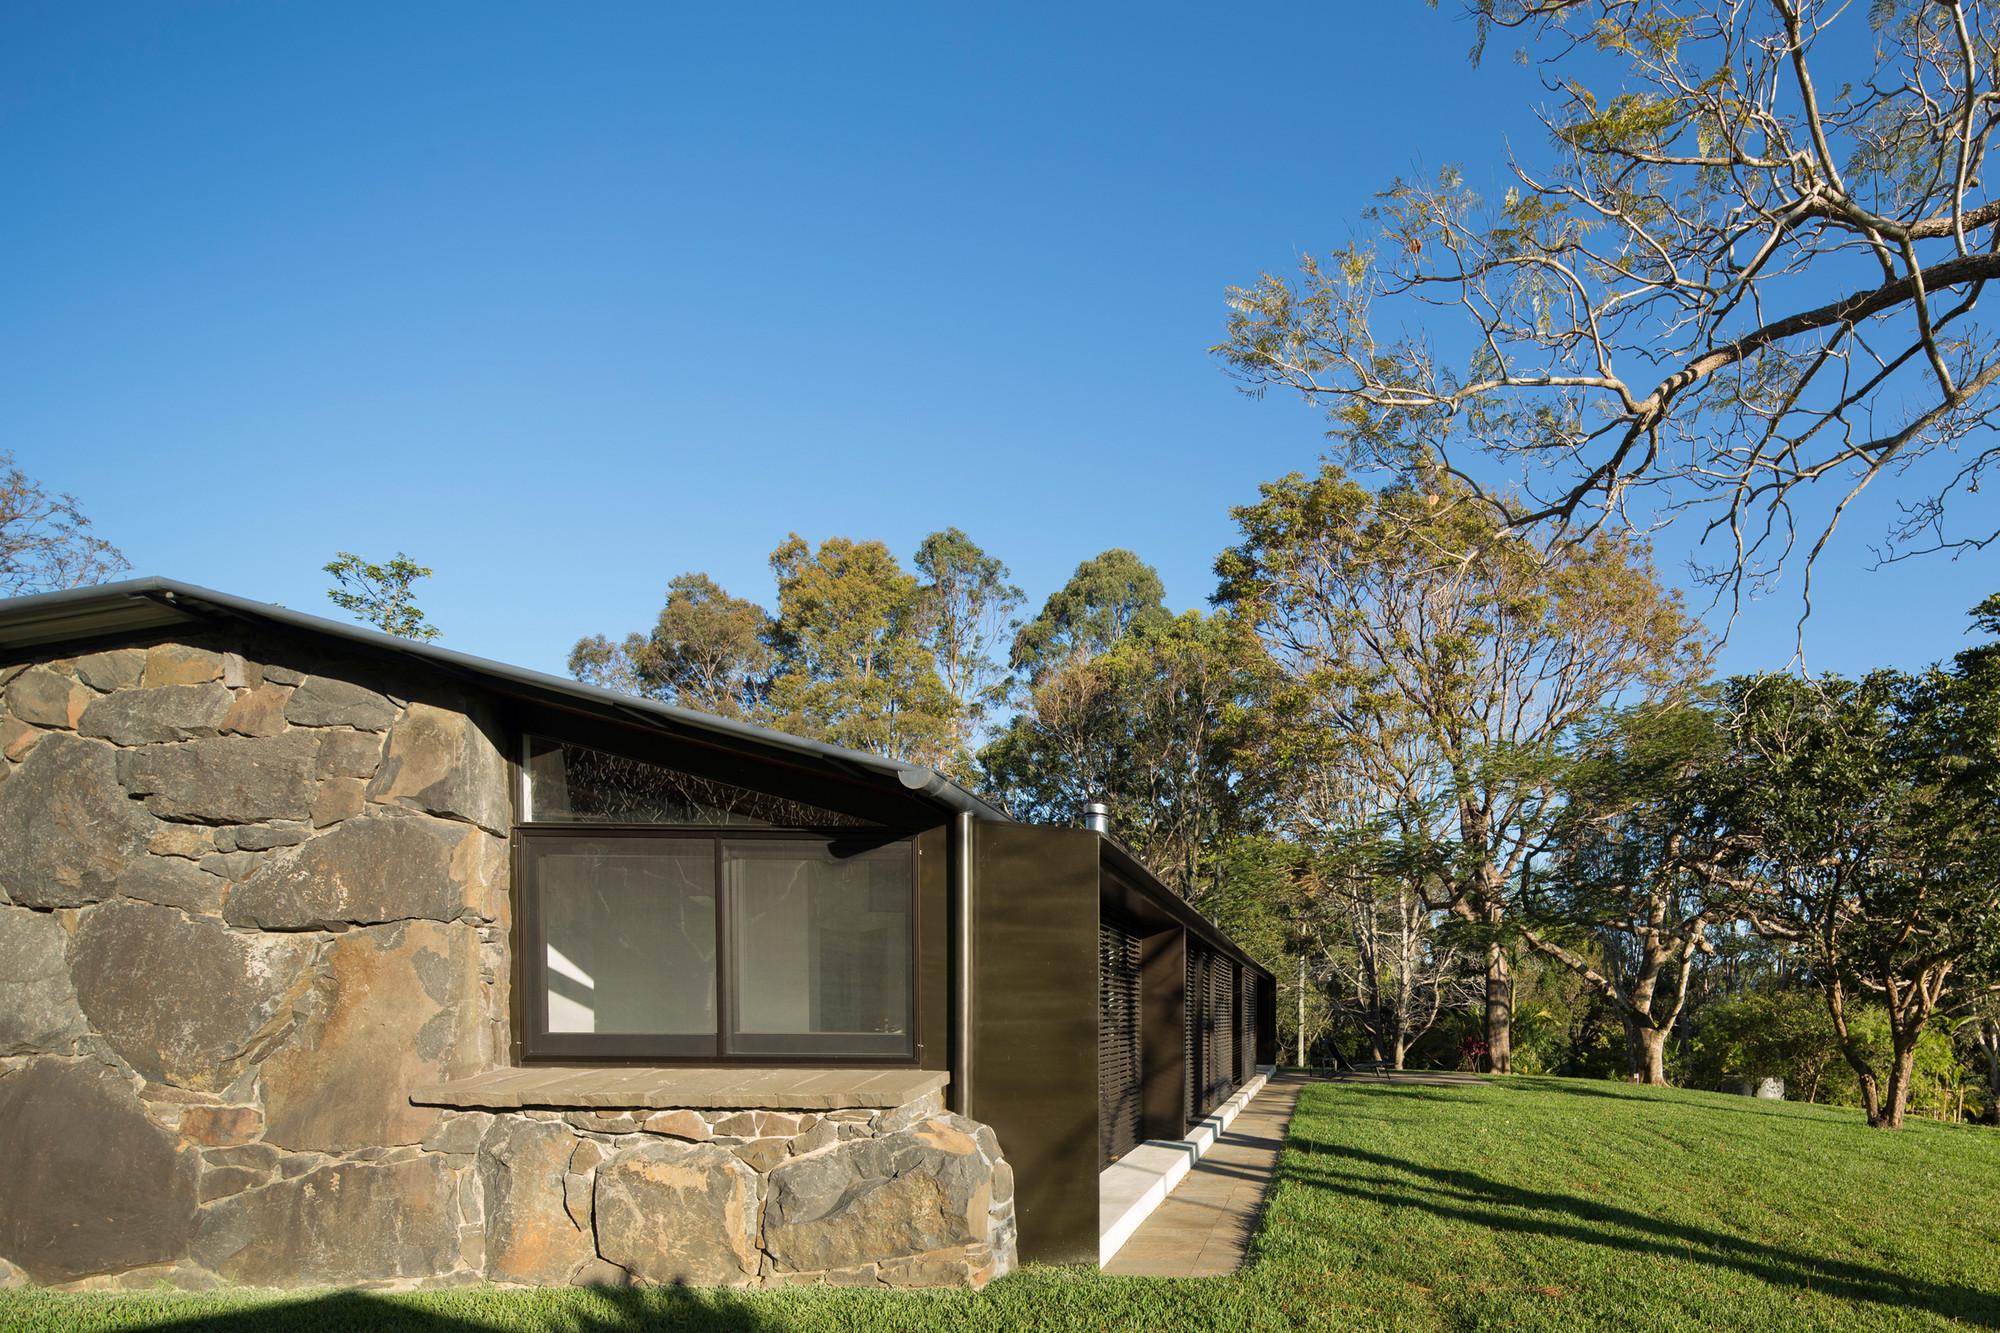 Casa de Pedra / CHROFI, © Brett Boardman